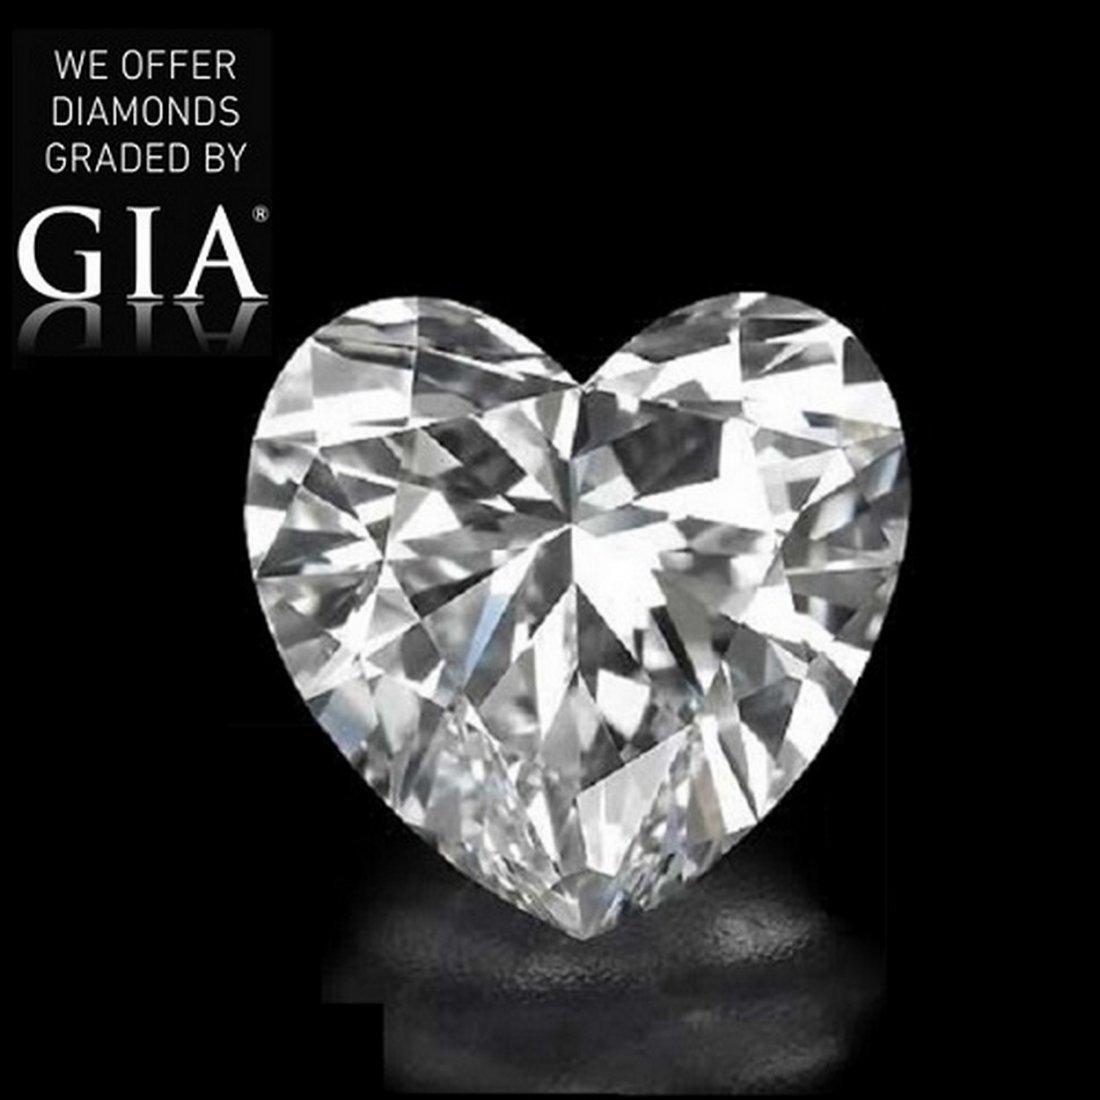 3.45 ct, Color D/FL, Heart cut Diamond